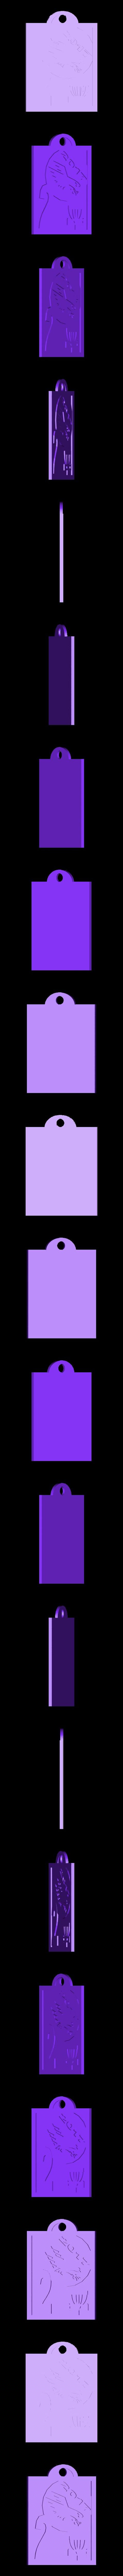 Disc_Bag_Tag_2.stl Download free STL file Disc Golf Bag Tag • 3D print design, mrhers2